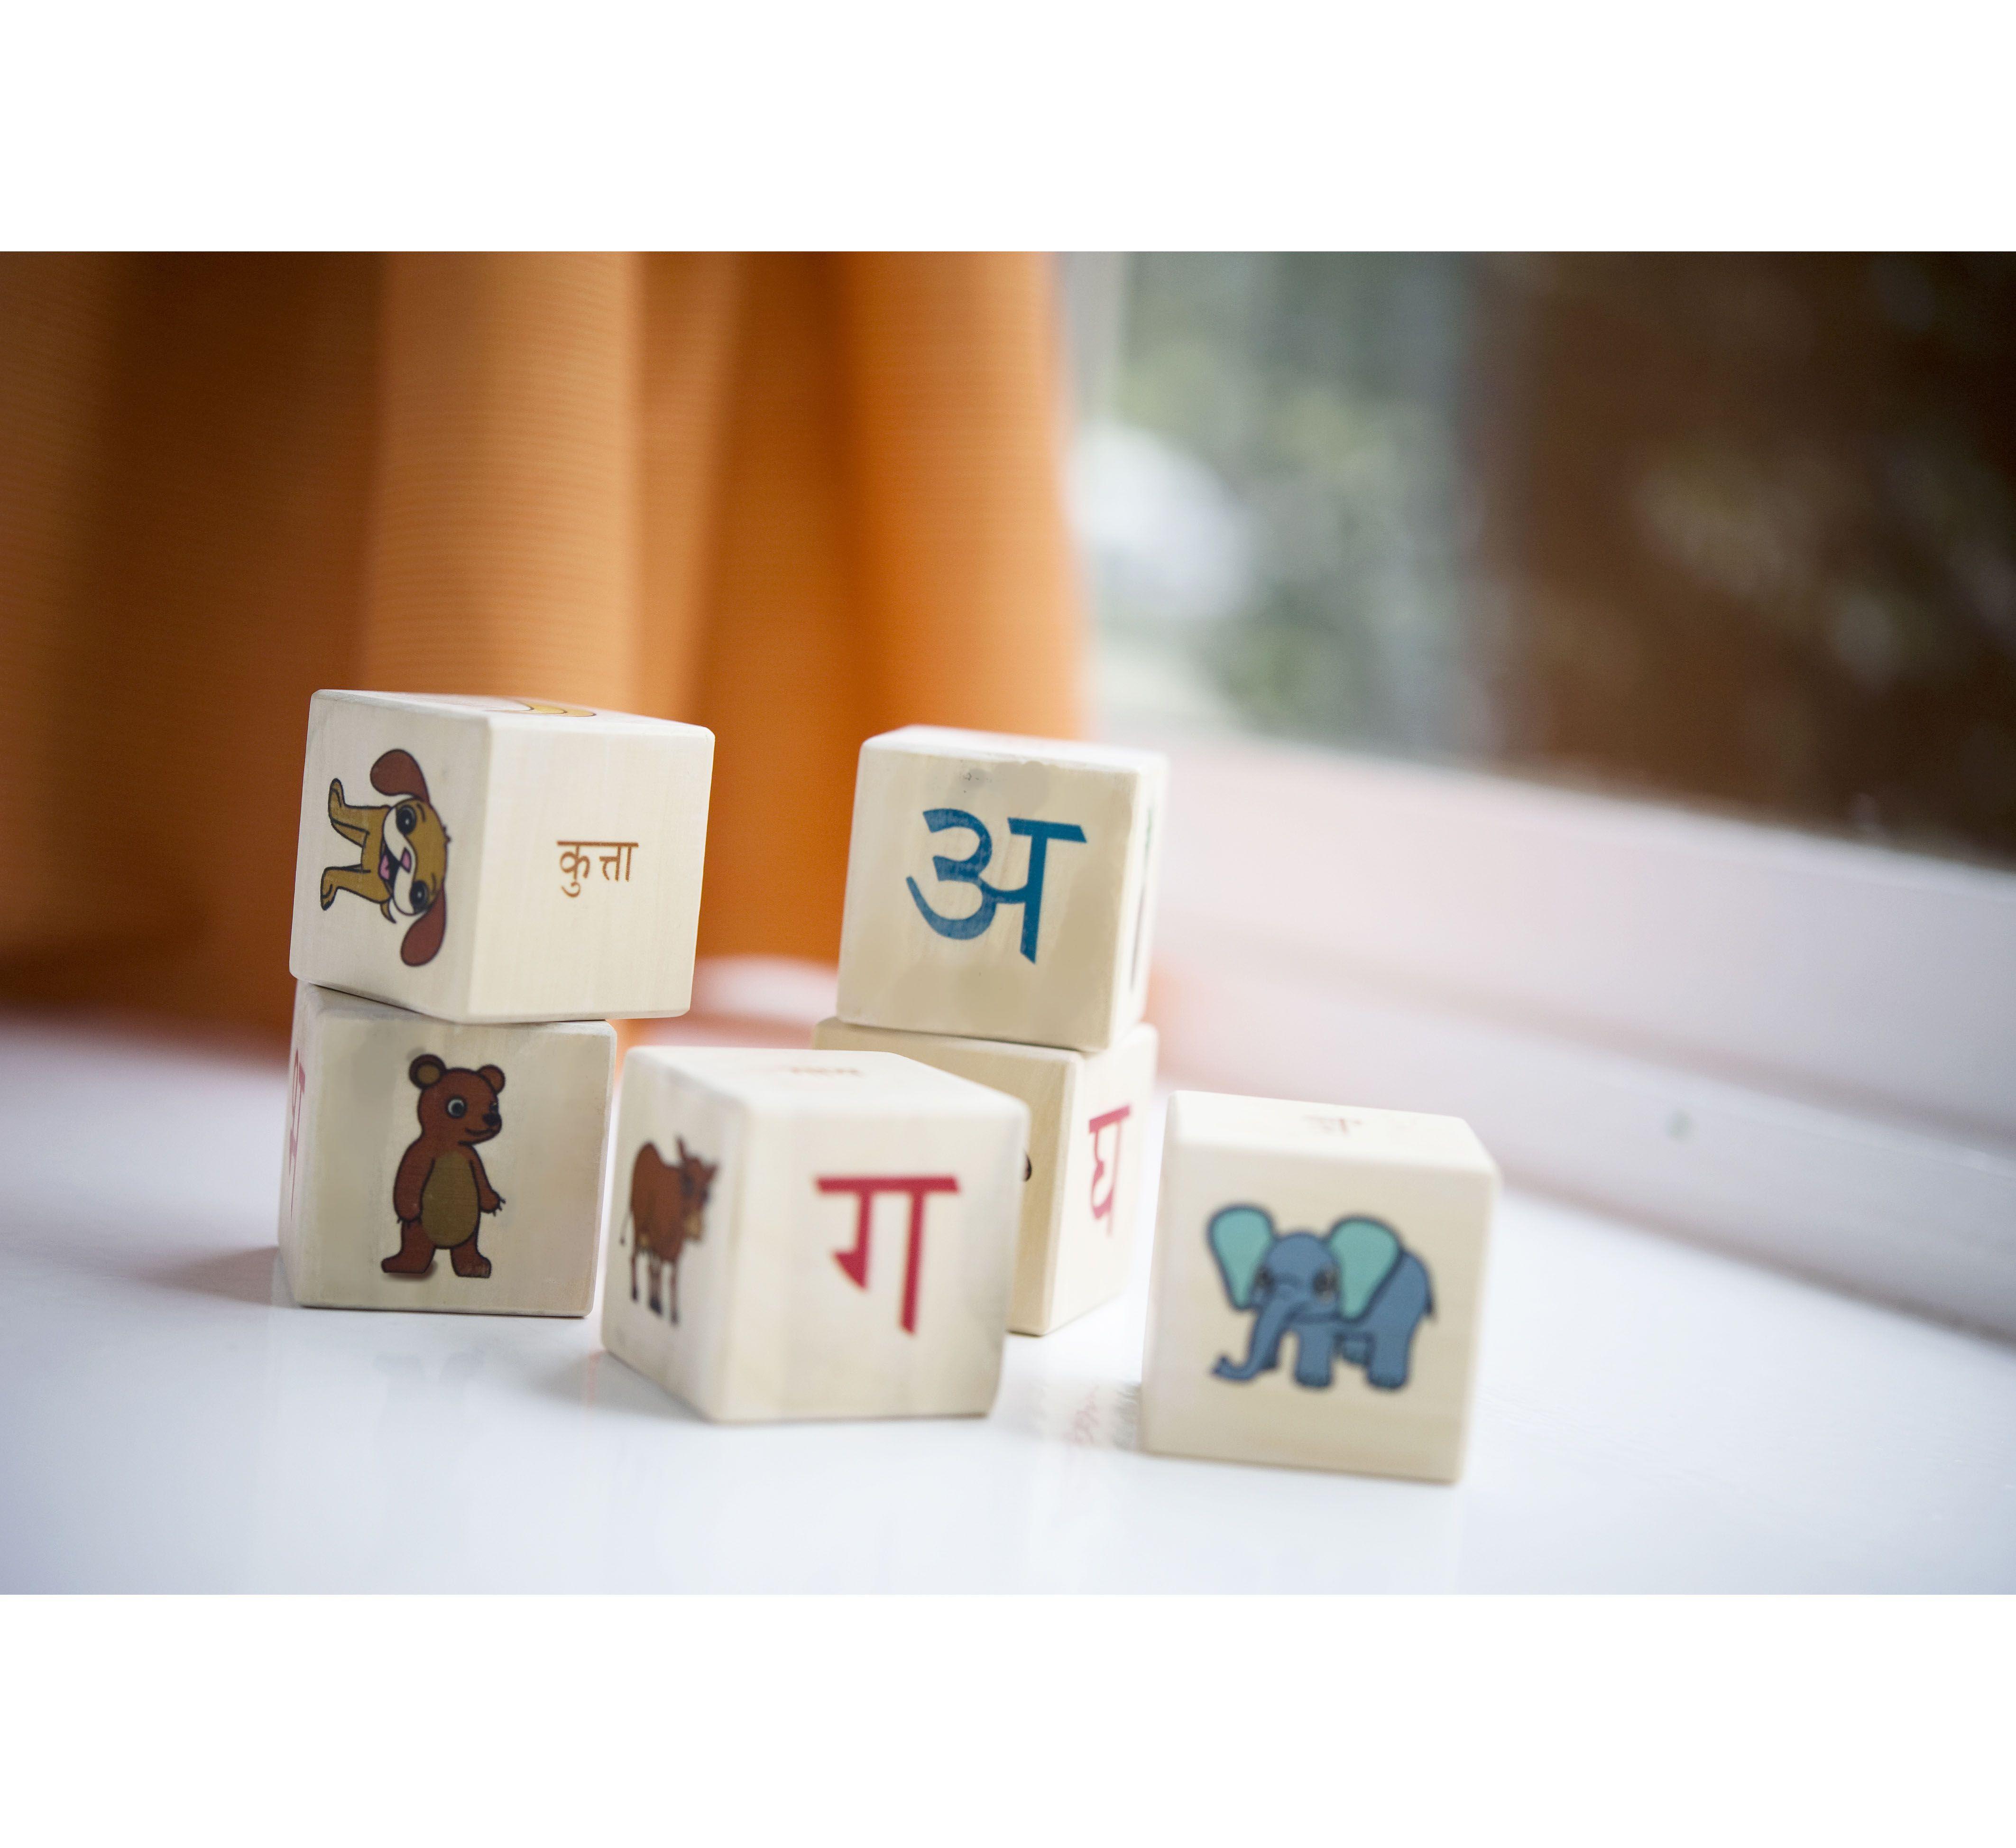 Gnaana Albhabet Blocks Alphabet Blocks Hindi Alphabet How To Memorize Things [ 3896 x 4251 Pixel ]